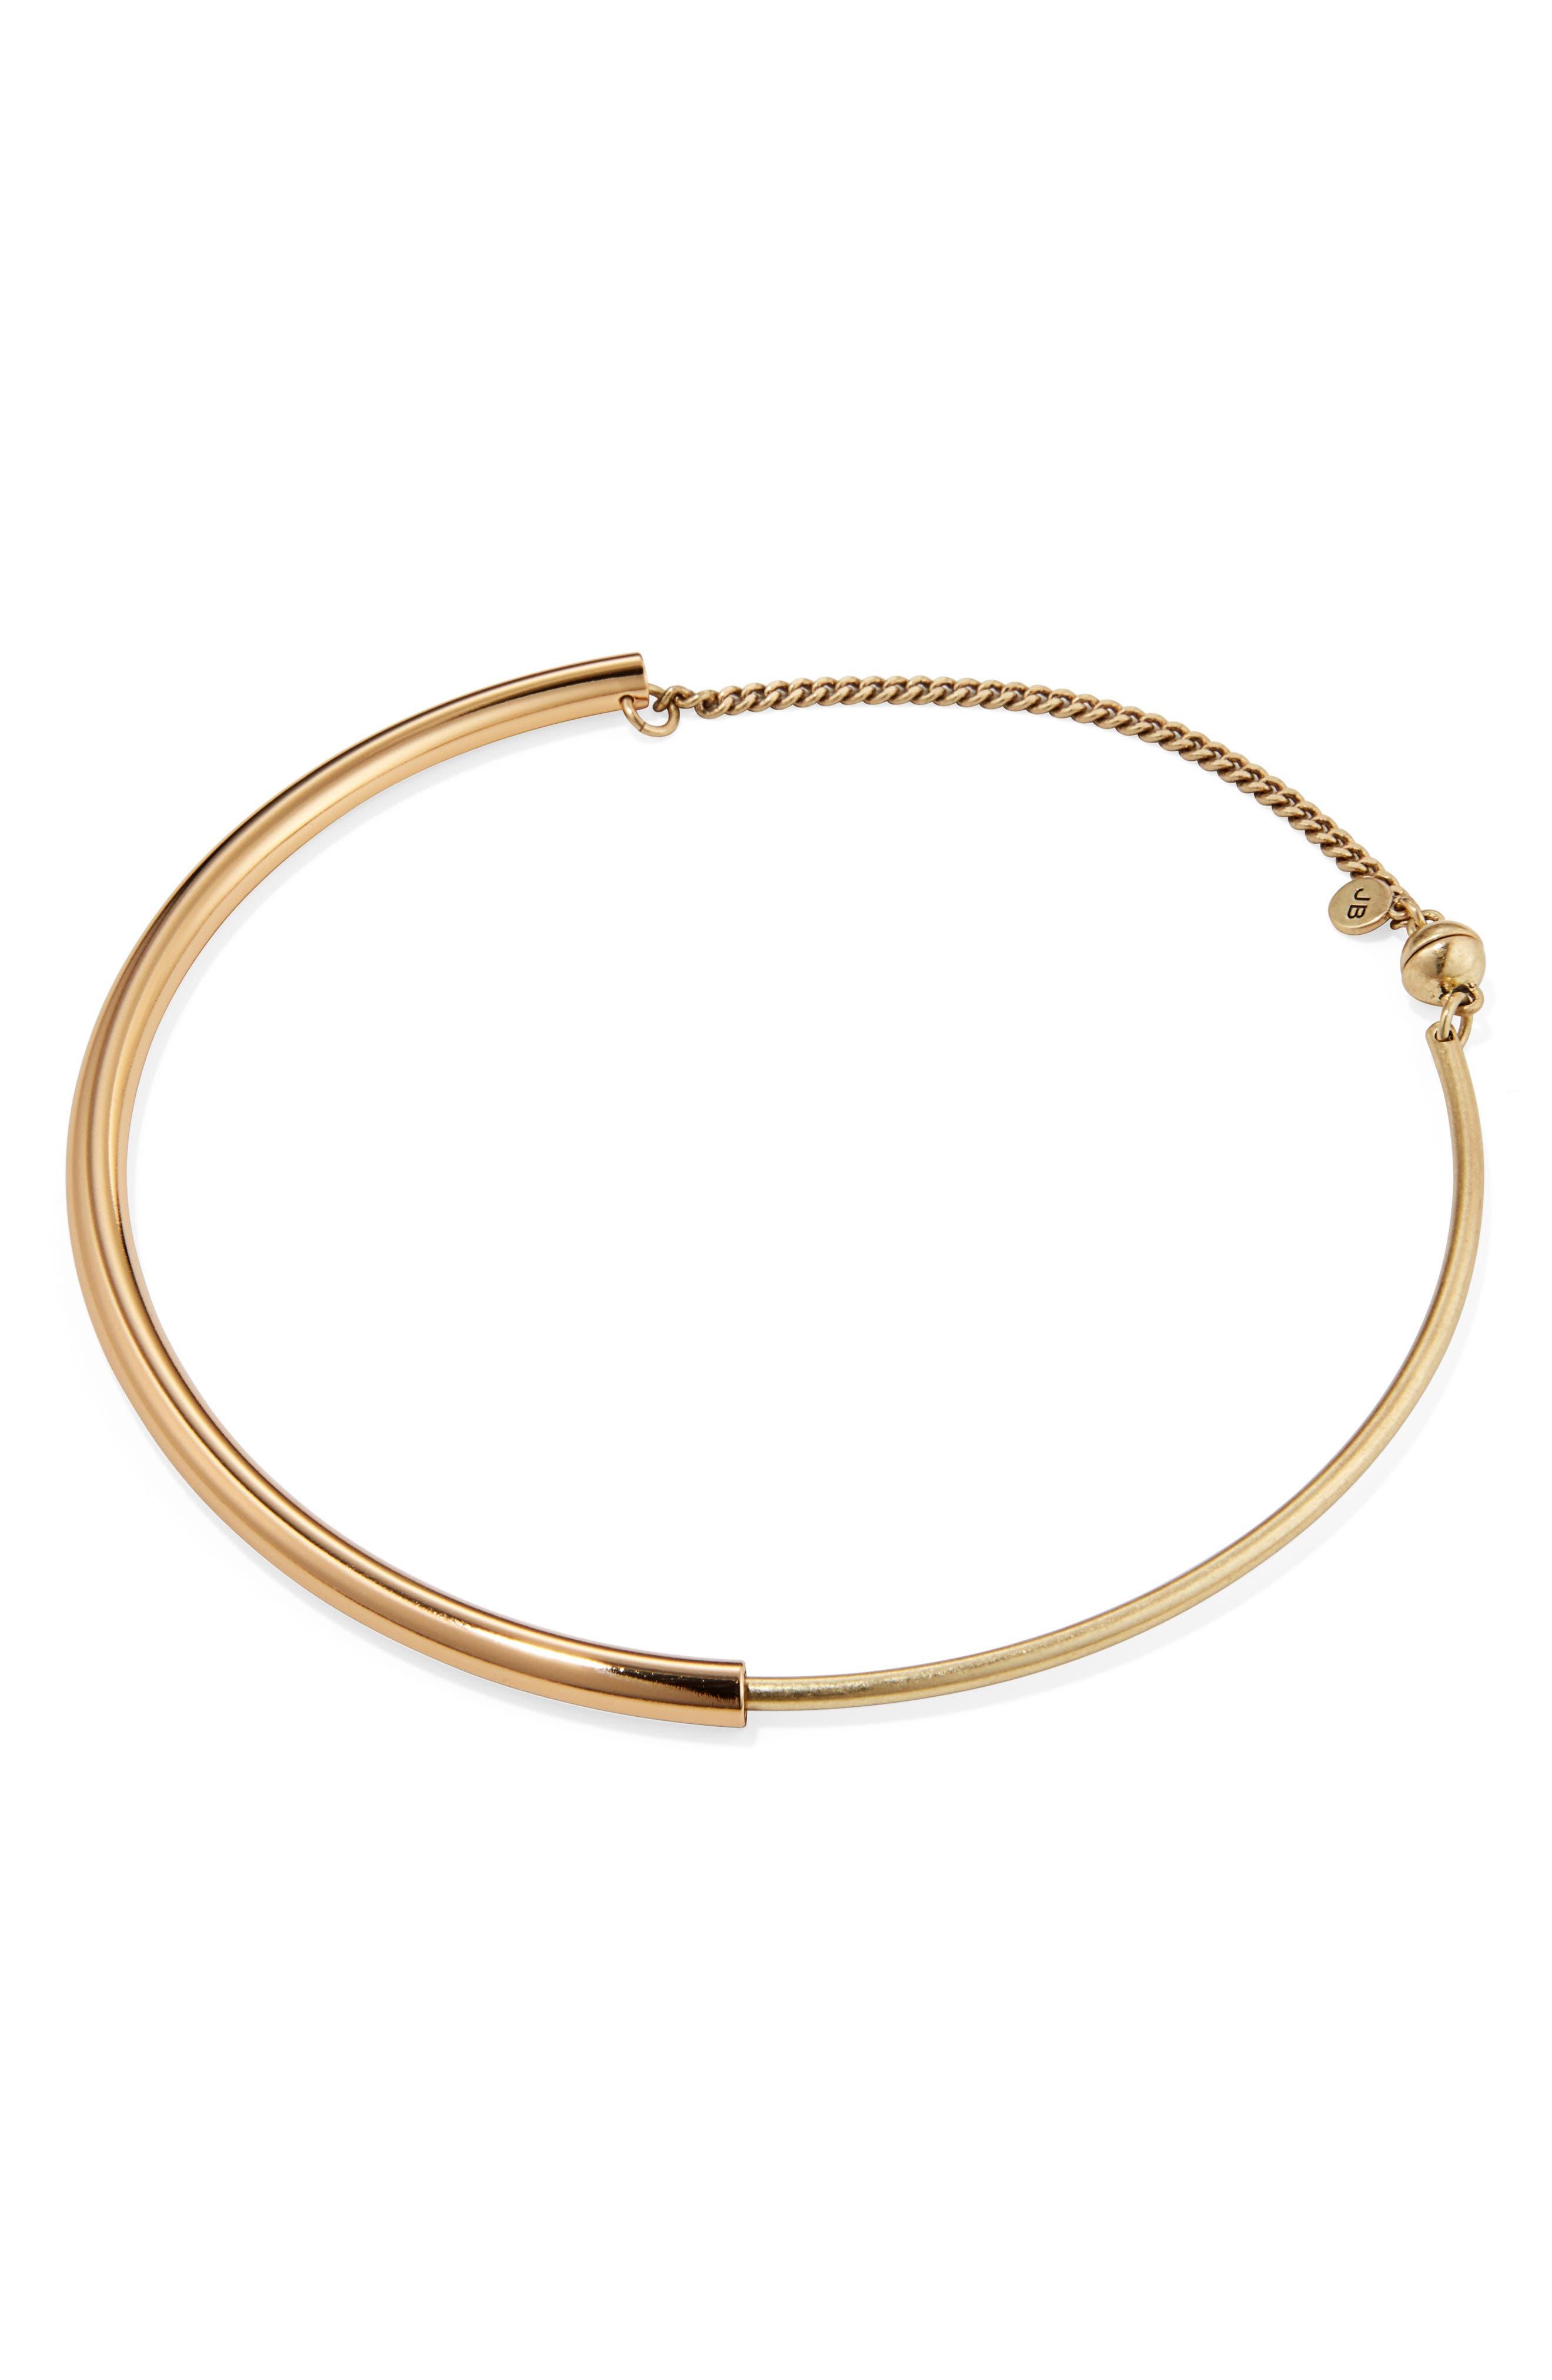 Lola Collar Necklace,                         Main,                         color, 710